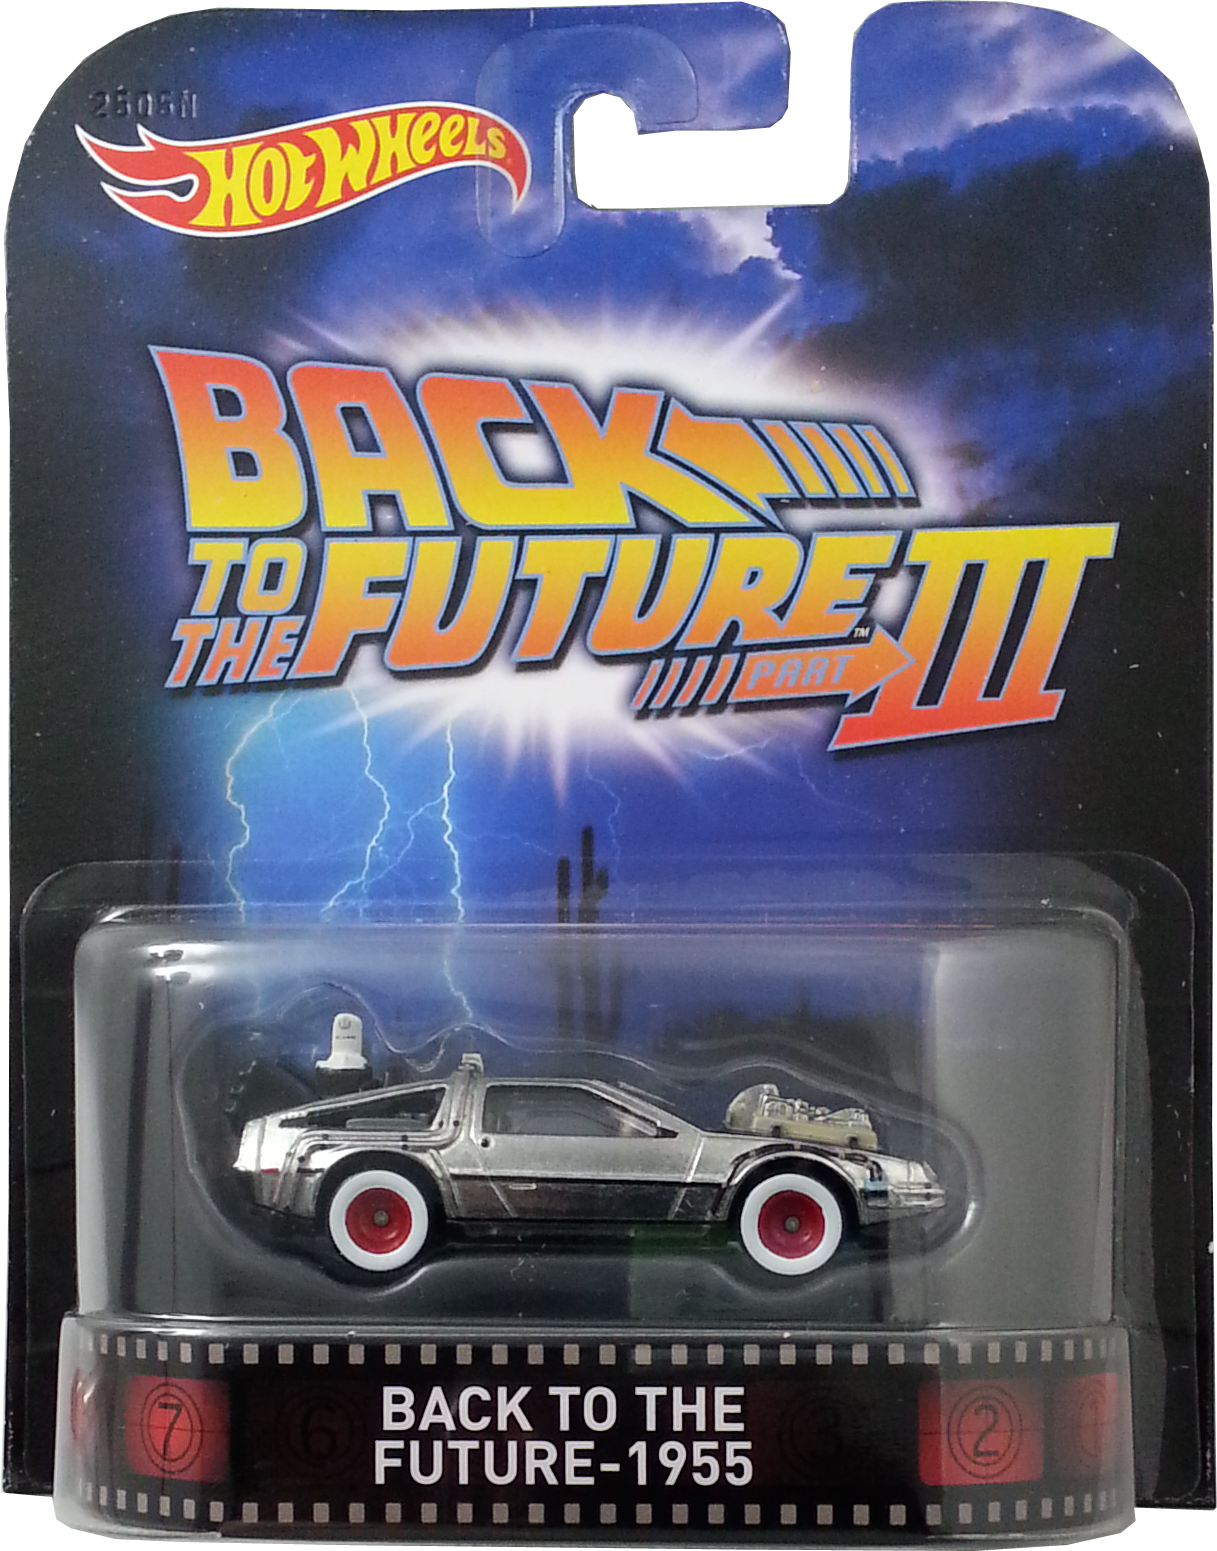 Back To The Future 1955 Hot Wheels Wiki Fandom